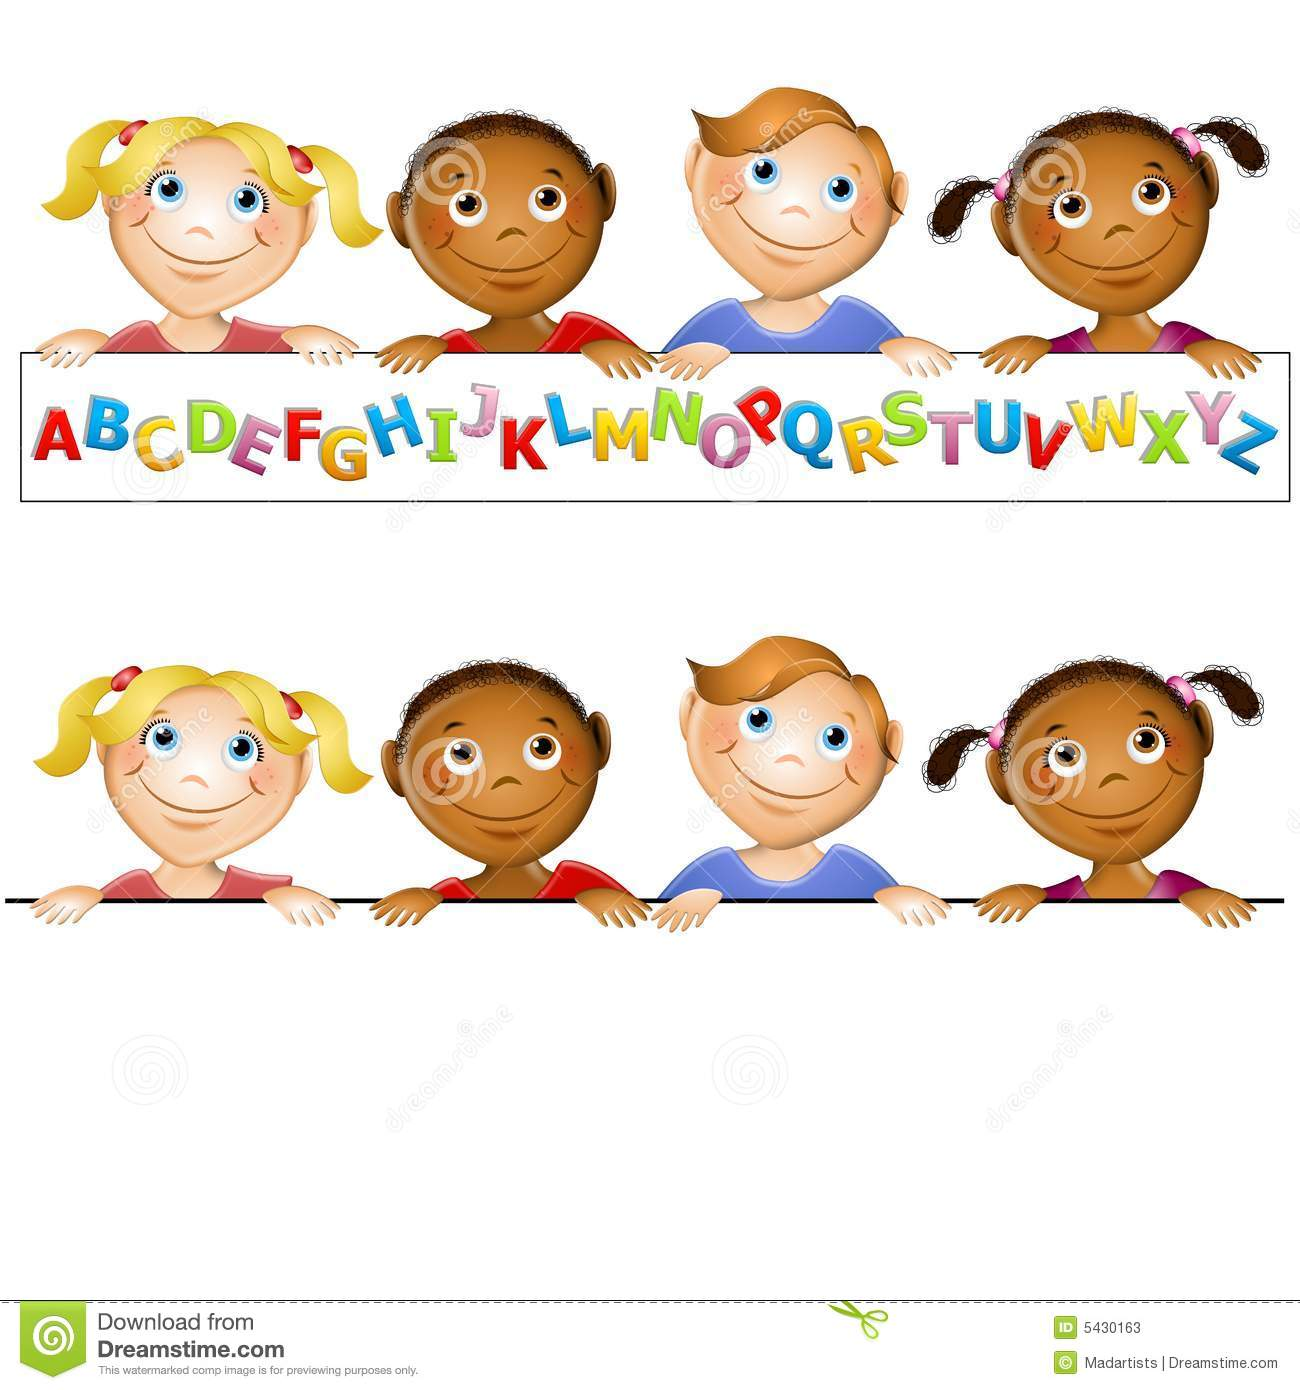 Kindergarten alphabet clipart image royalty free stock Kindergarten Stock Illustrations – 24,885 Kindergarten Stock ... image royalty free stock